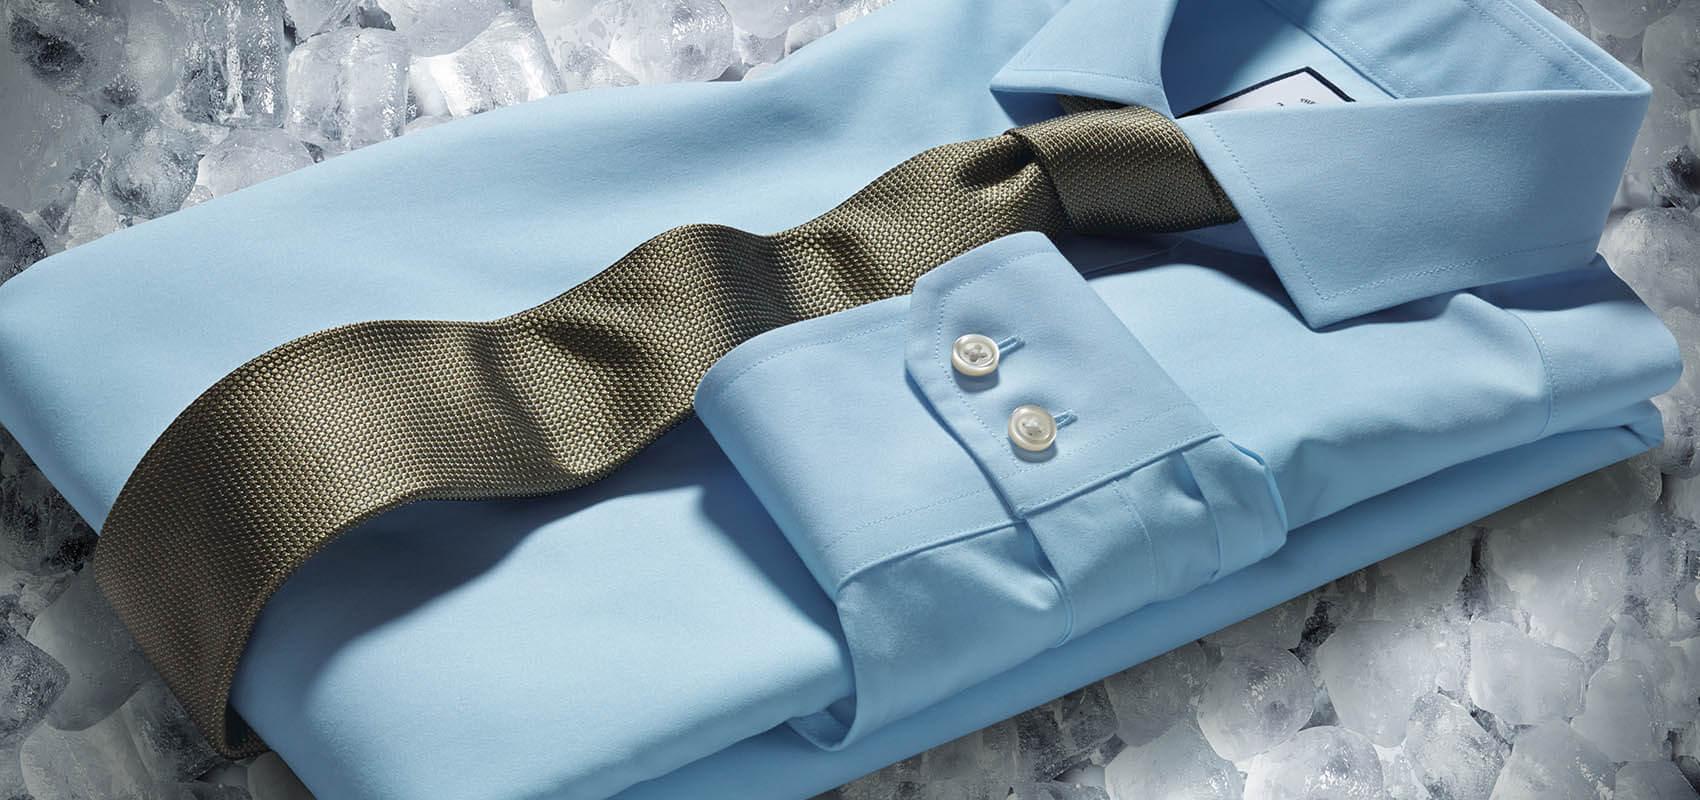 Charles Tyrwhitt Natural Cool Shirts